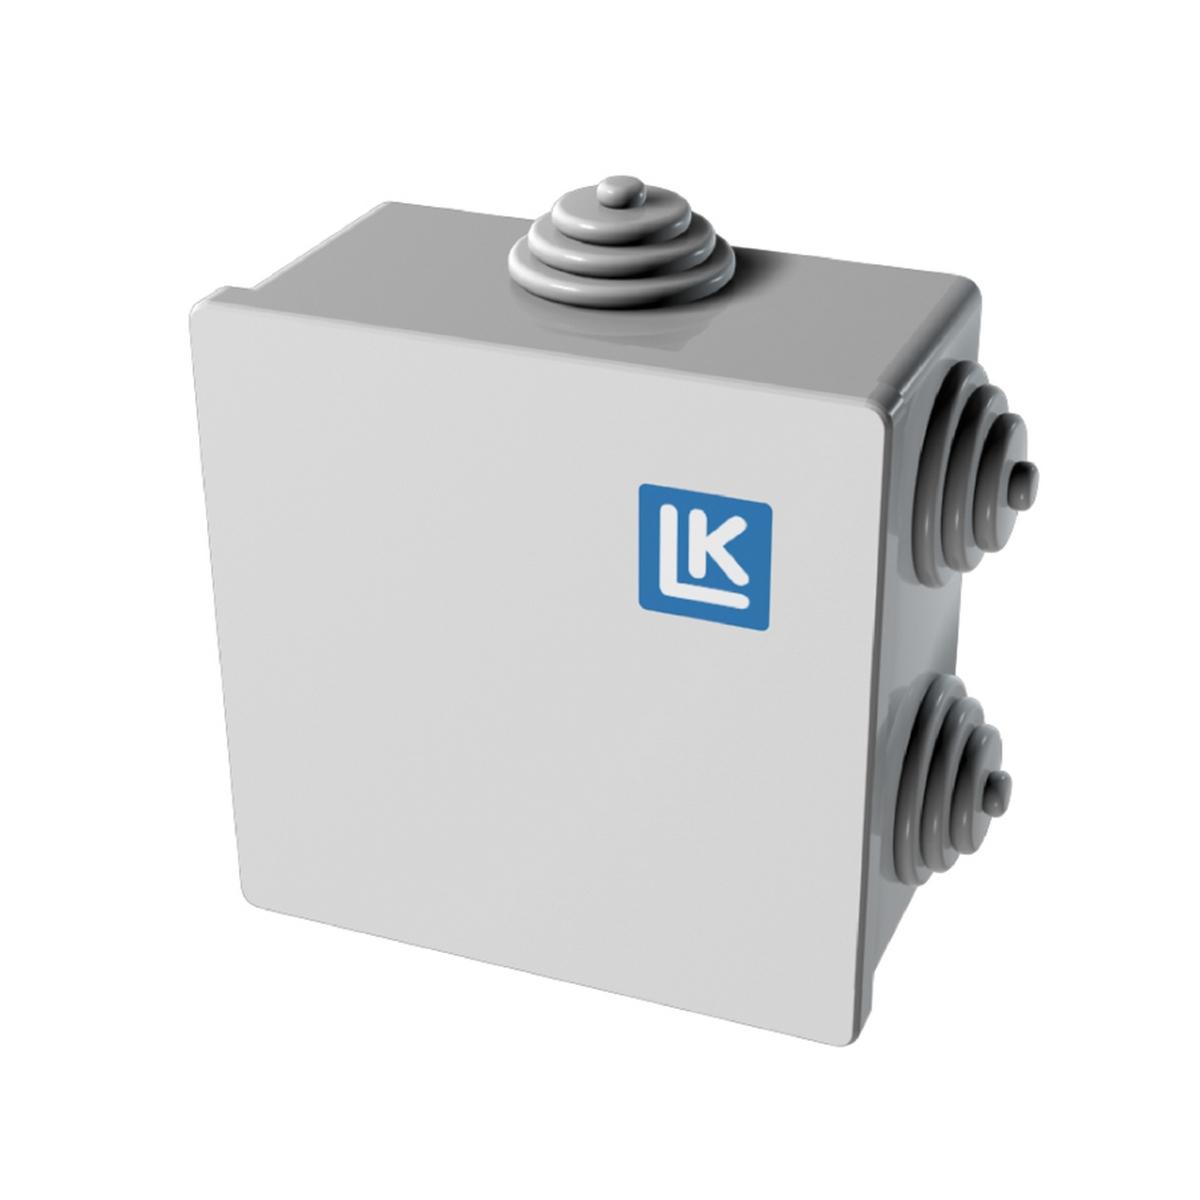 Kopplingsplint LK Systems 1